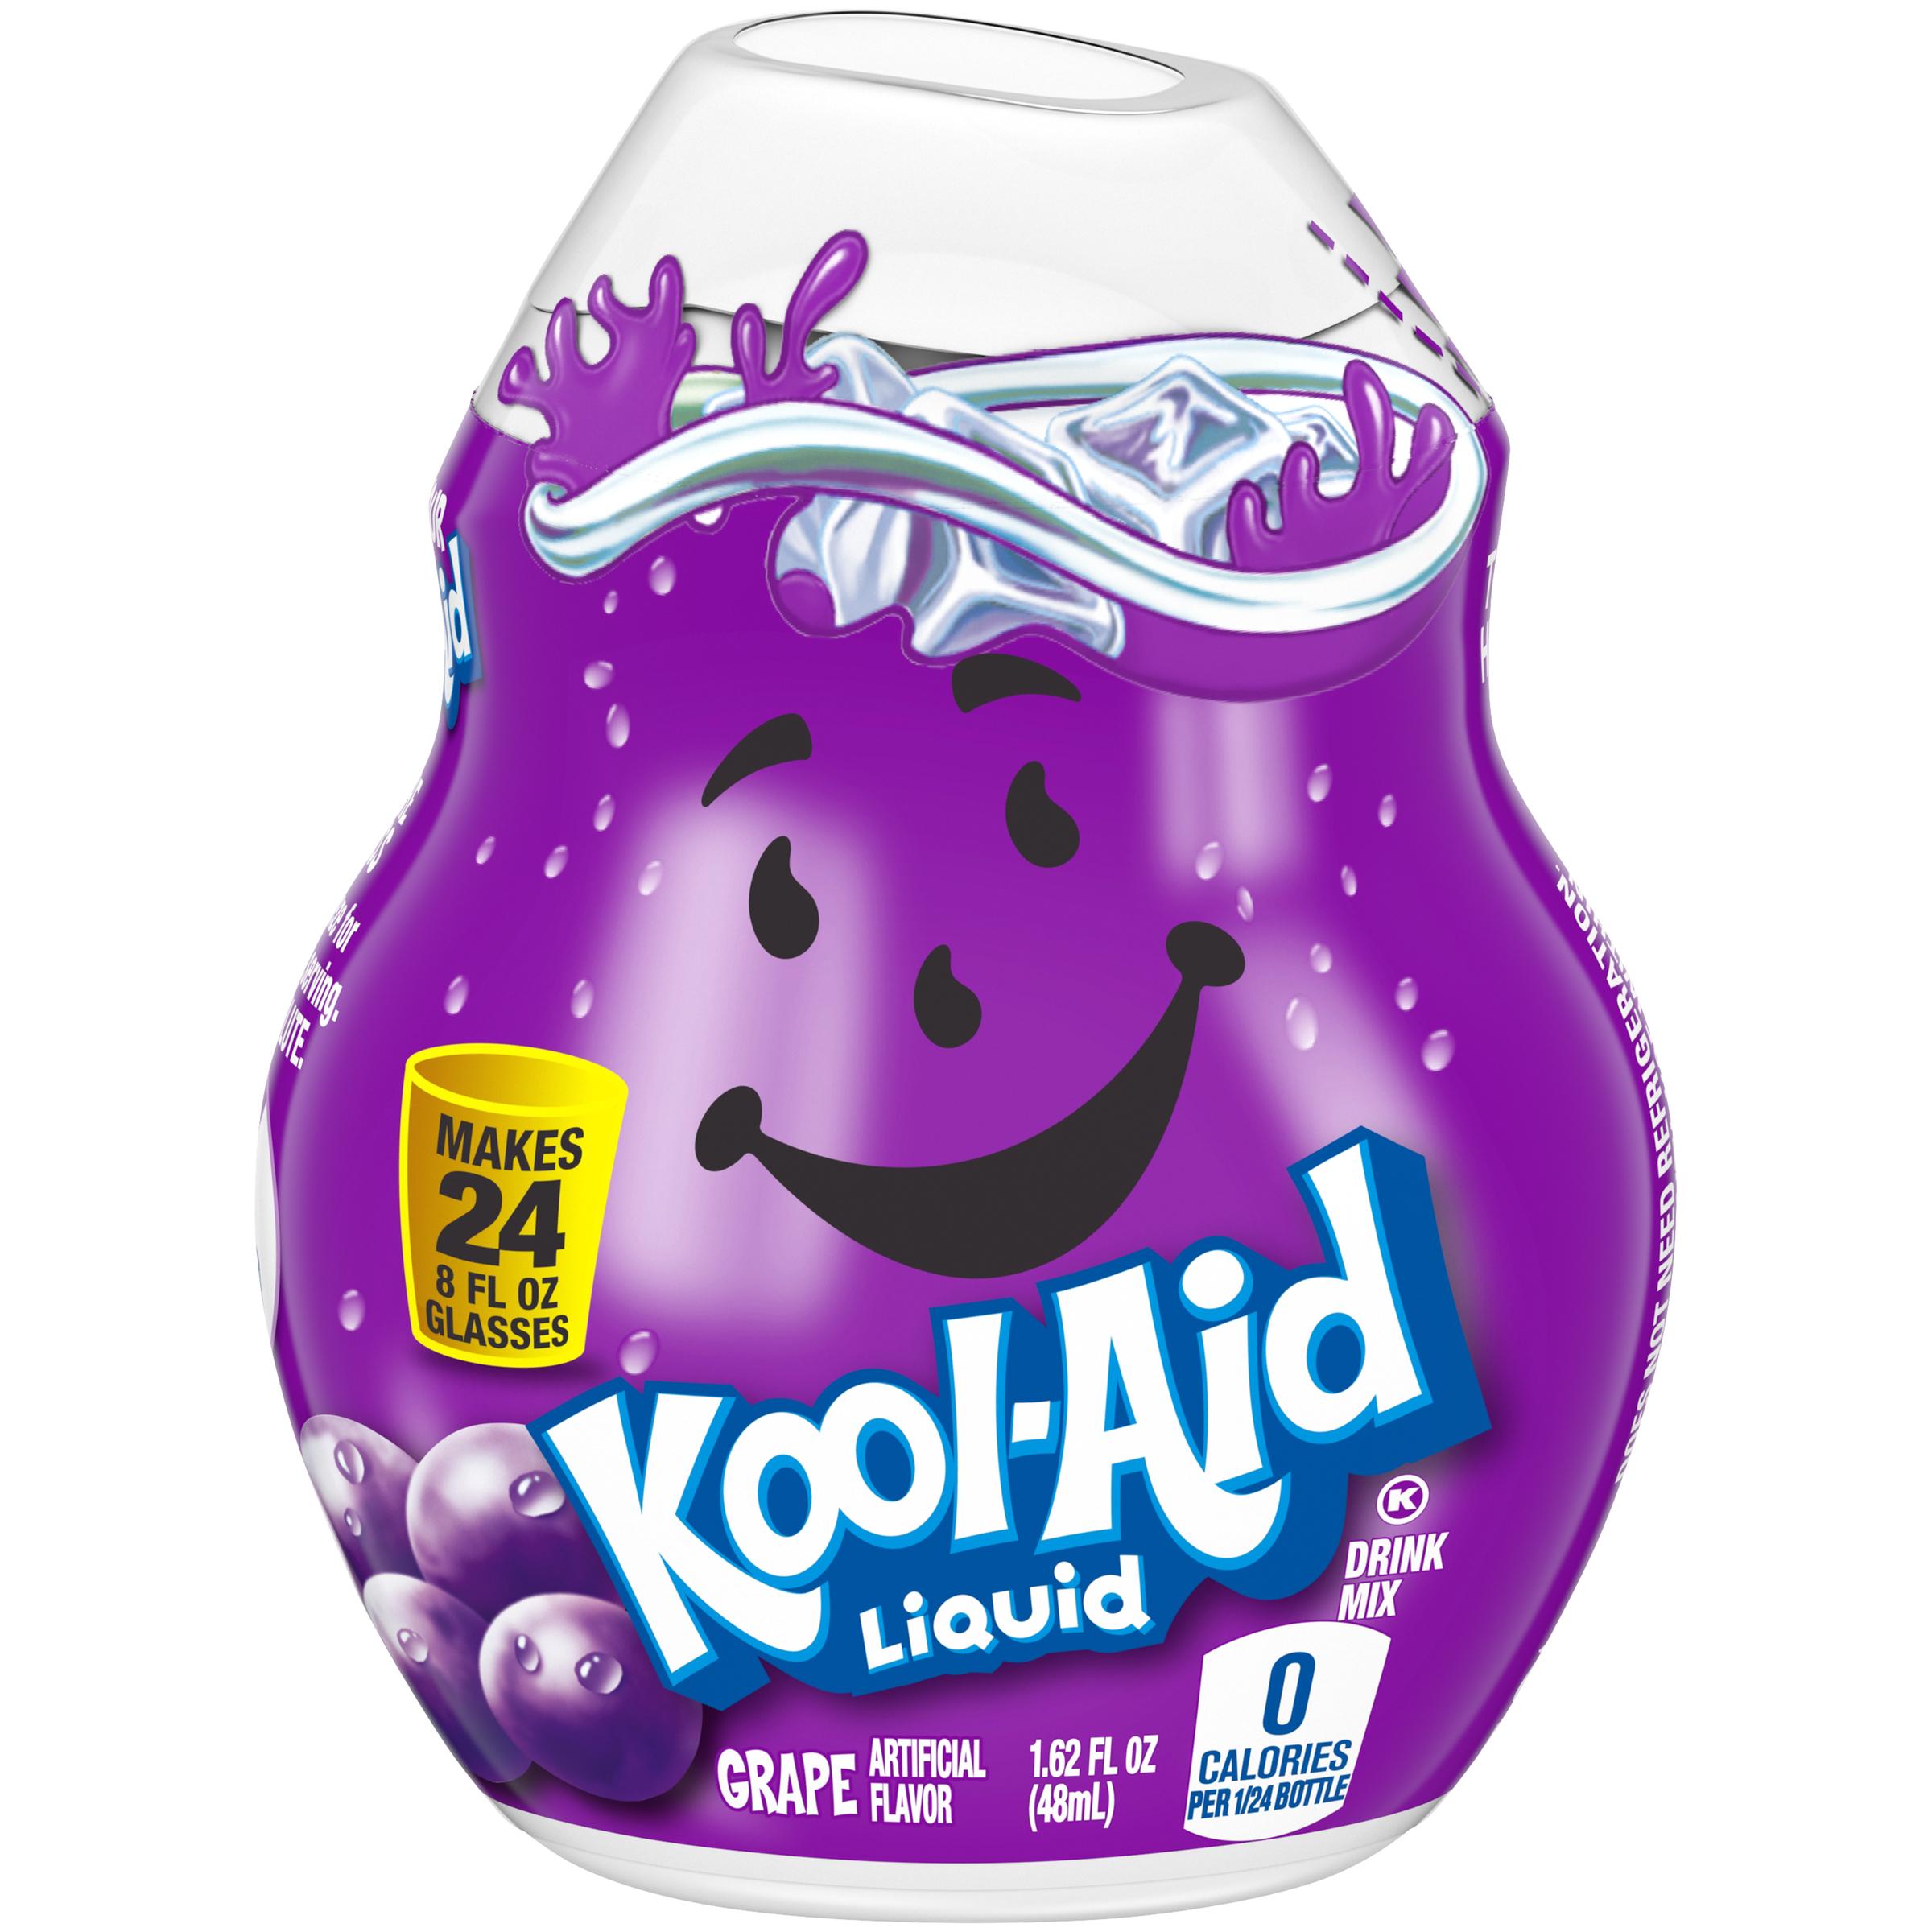 KOOL-AID Grape Liquid Drink Mix 1.62 fl oz  Bottle image